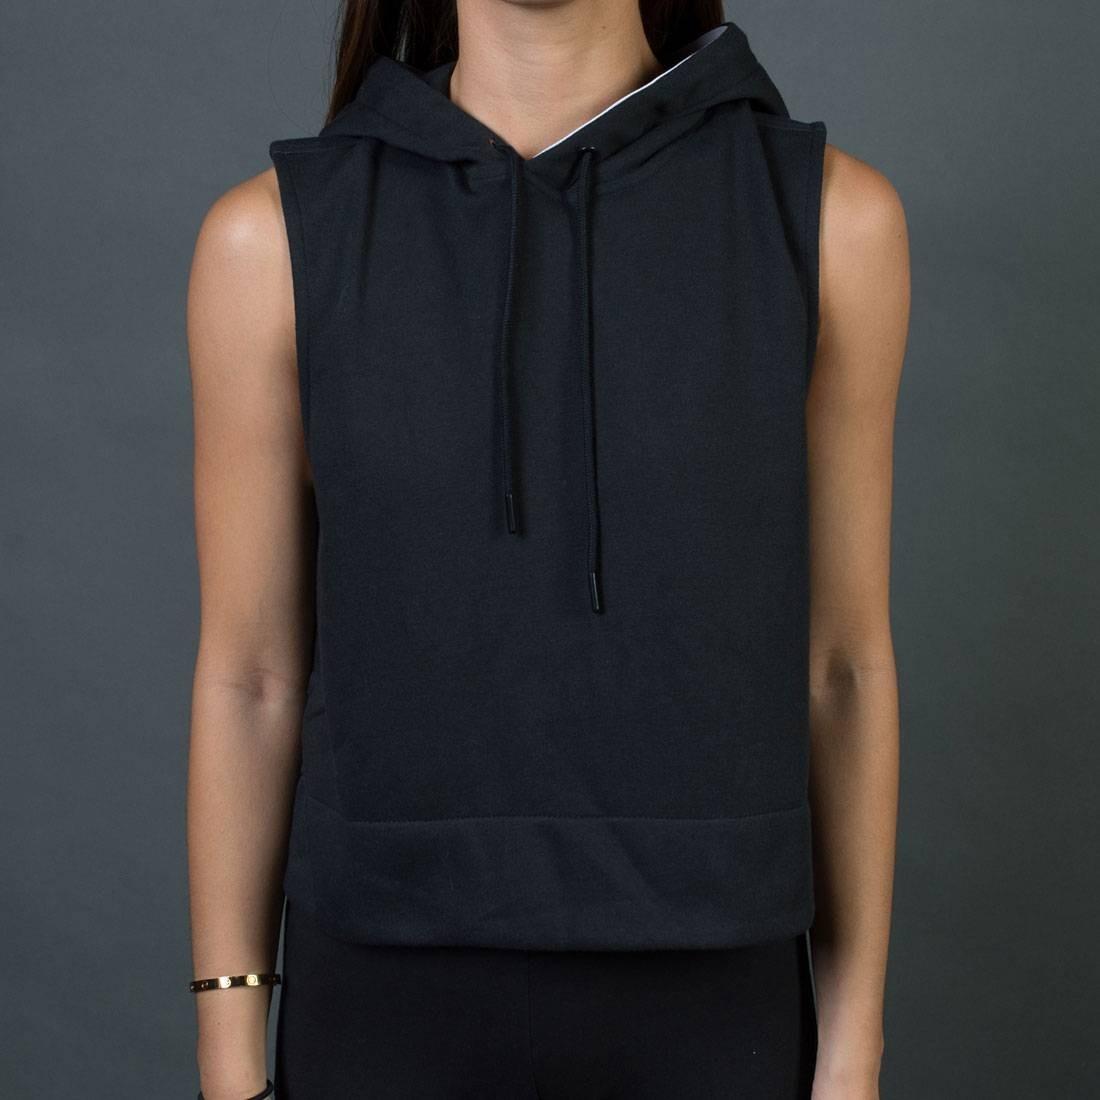 3c117aa6d1068 Adidas Women Sleeveless Pullover Hoodie black